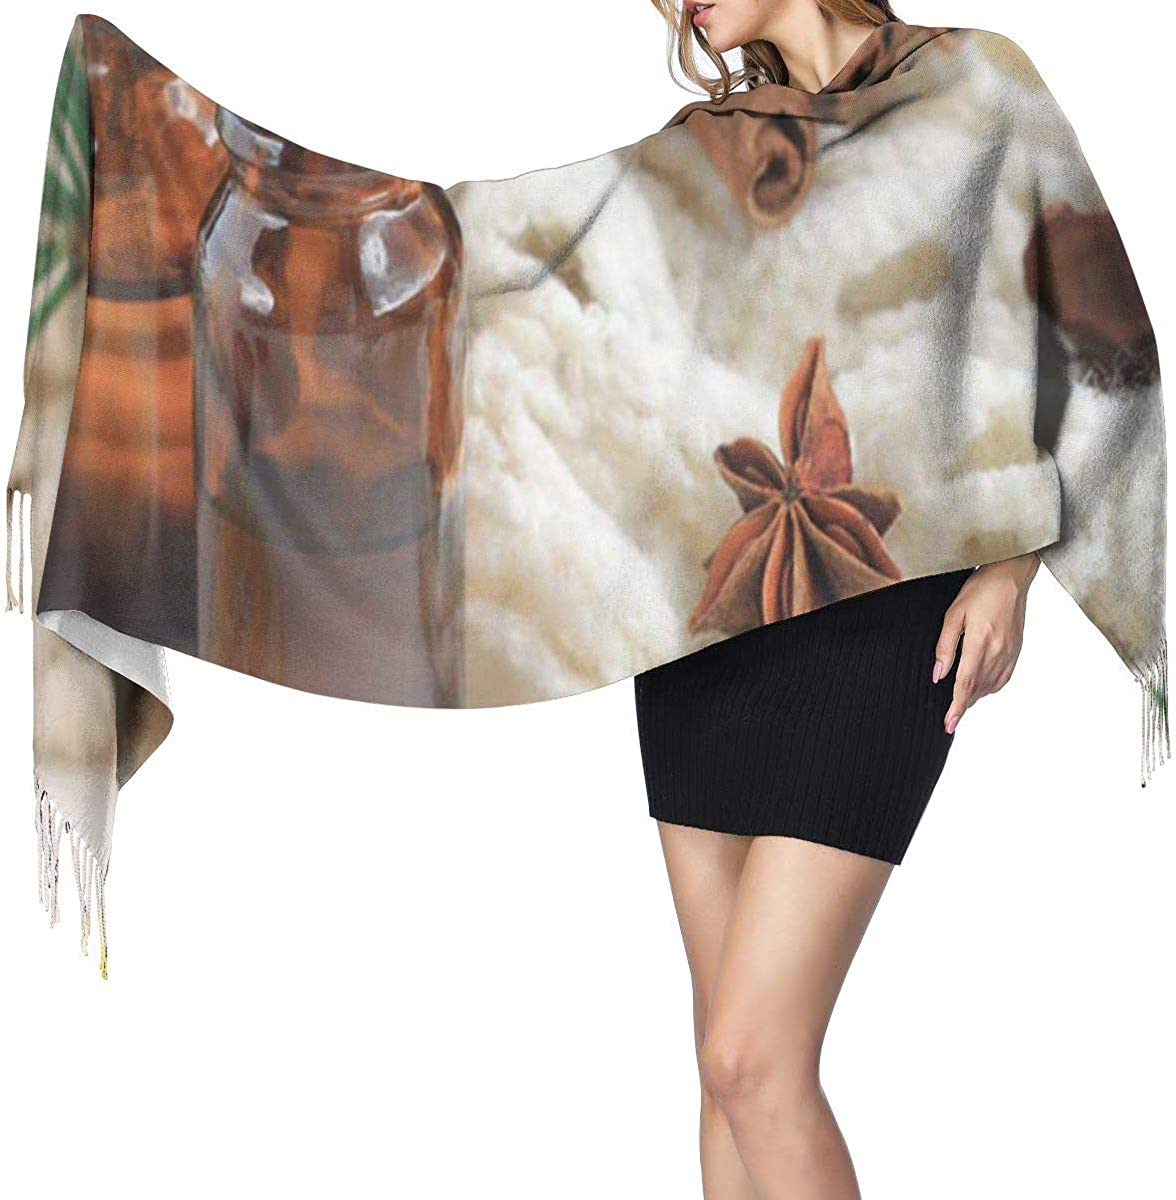 Essential Oil Blend Dark Glass Bottles Cinnamon Pine Twigs Soft Cashmere Scarf For Women Fashion Lady Shawls,Comfortable Warm Winter Scarfs